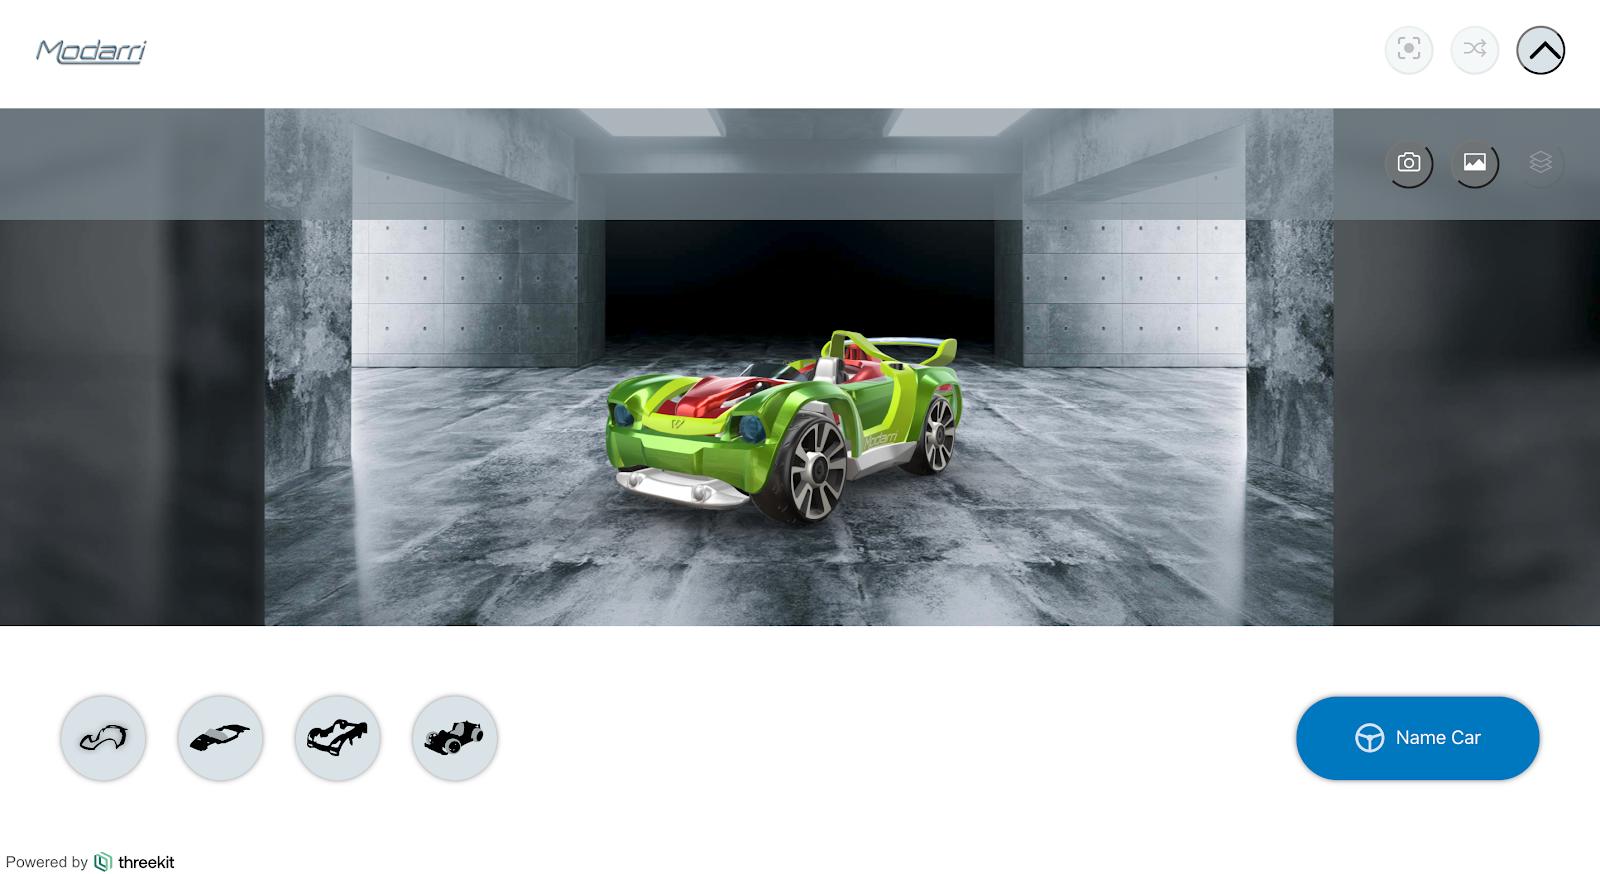 Modarri toy car configurator